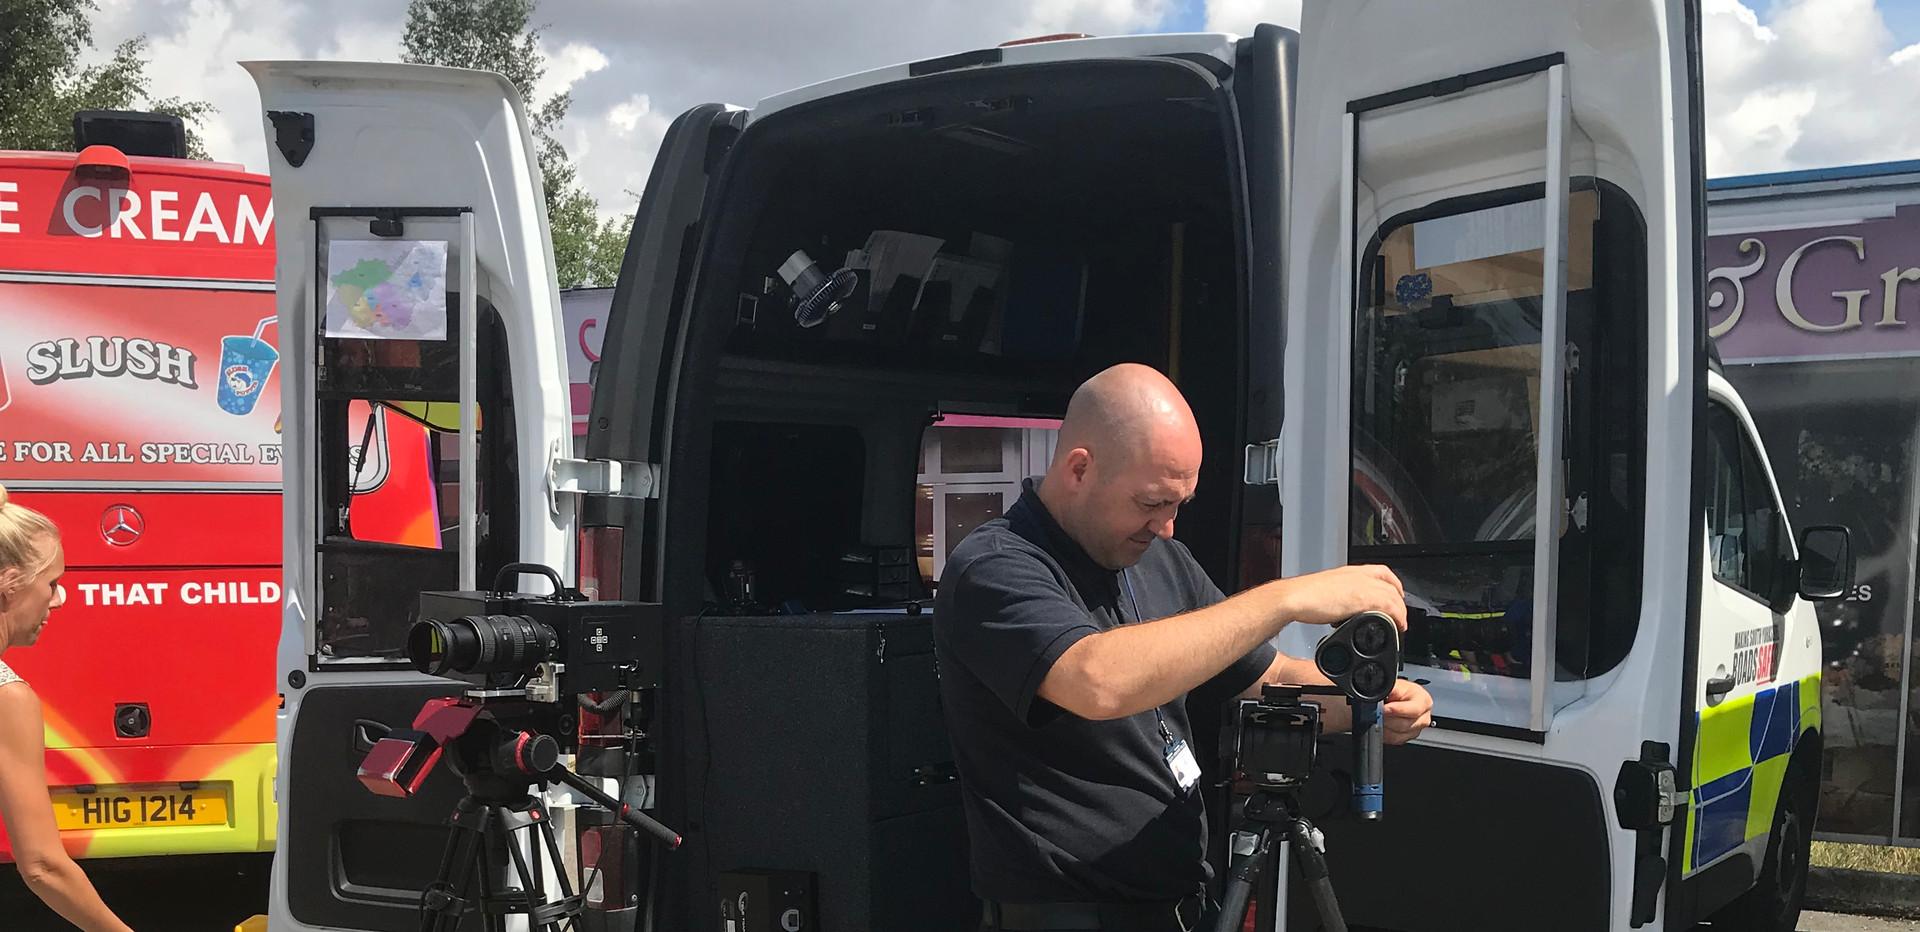 Safety Camera vehicle